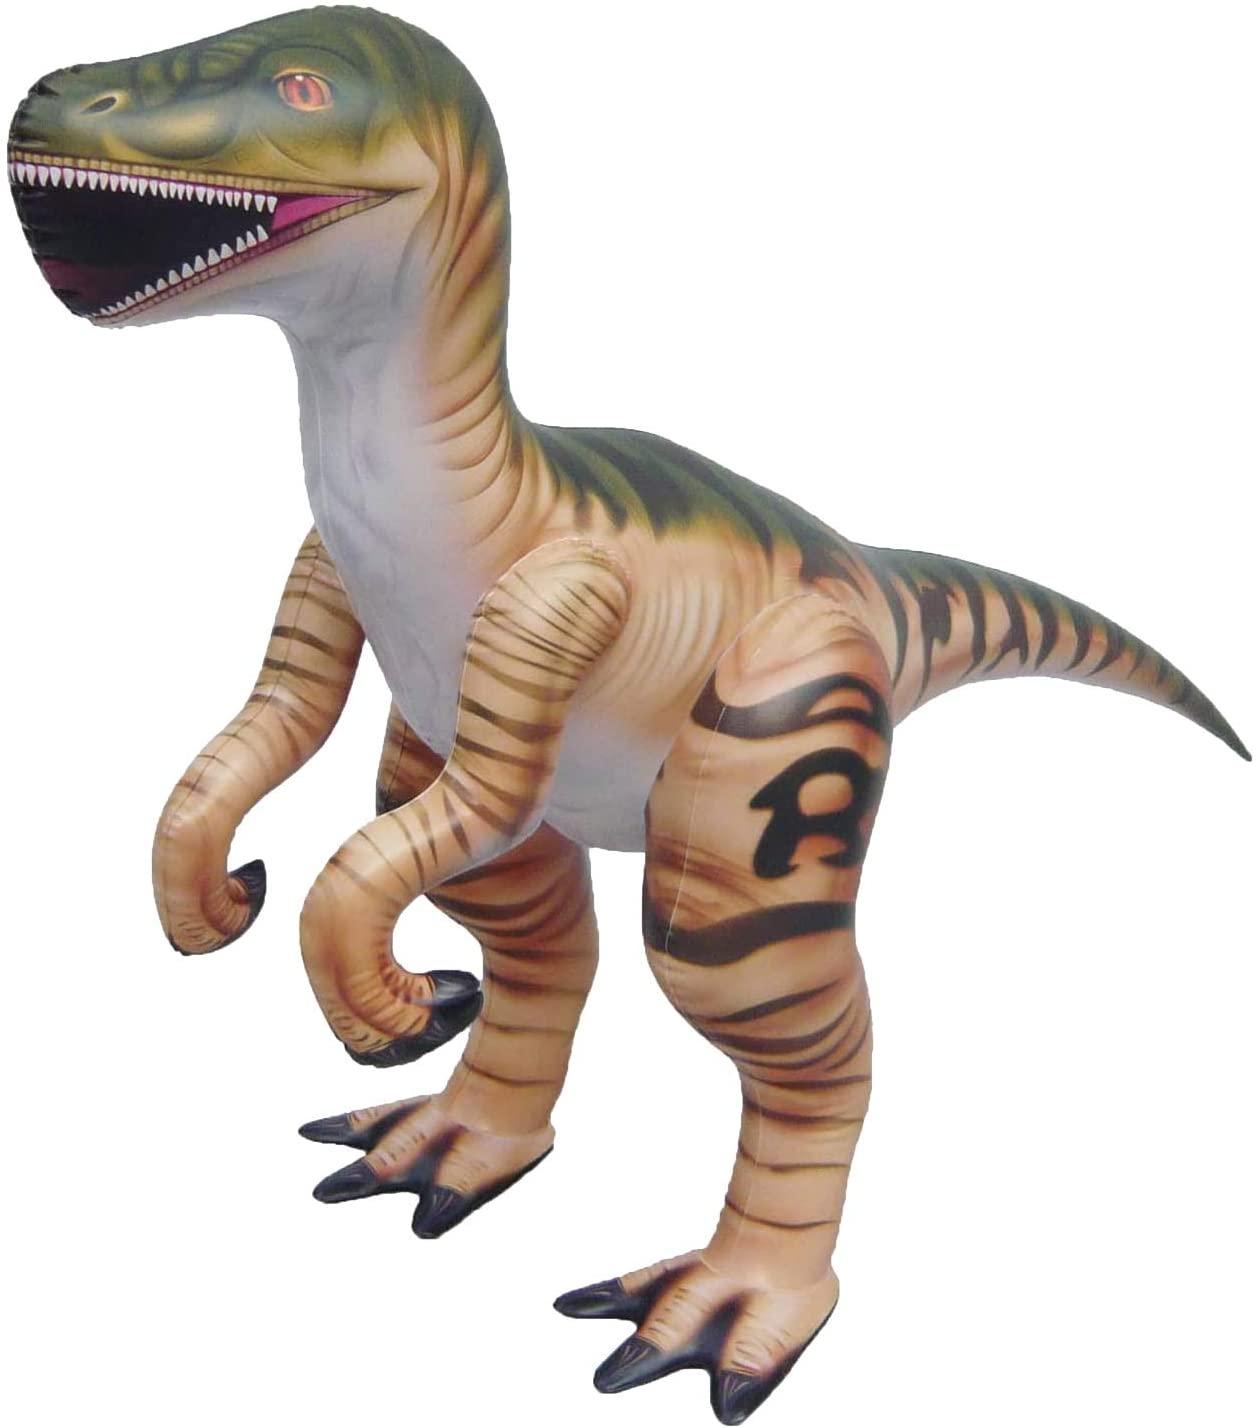 Jet Creations 51 inch Inflatable Plush Velociraptor Raptor, Dinosaur World Jurassic Room Décor Party Favors Decorations, DI-RAPTOR